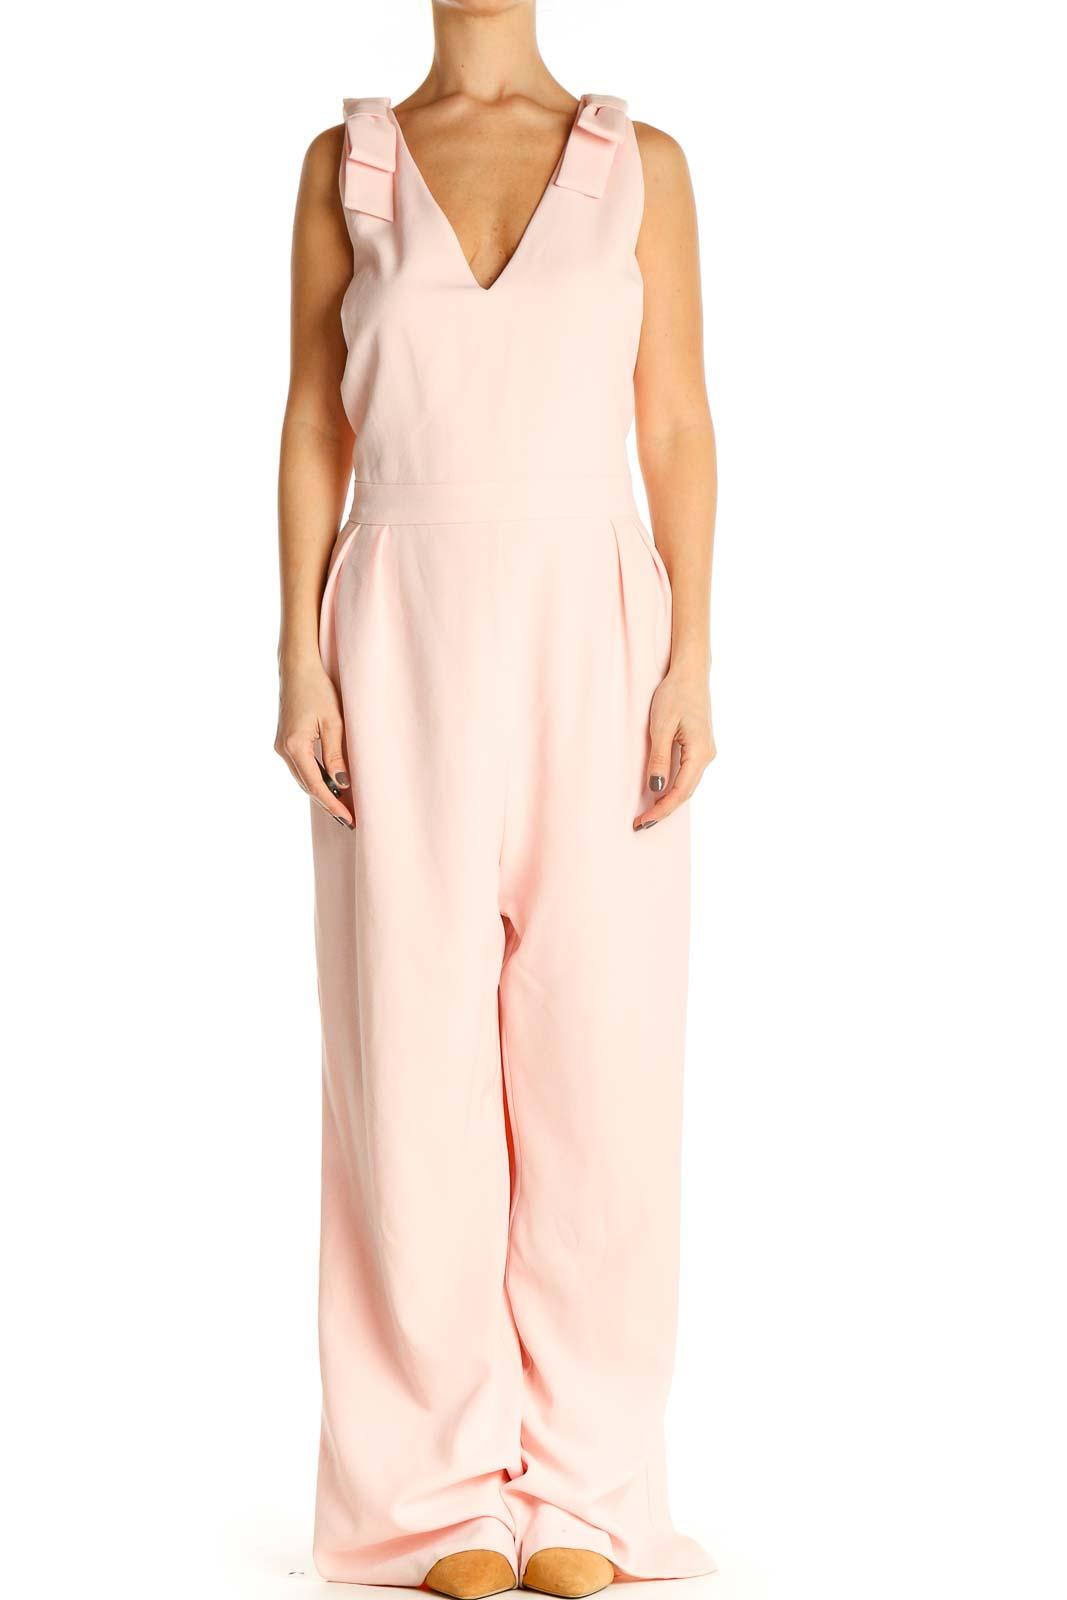 Pink Solid Column Dress Front